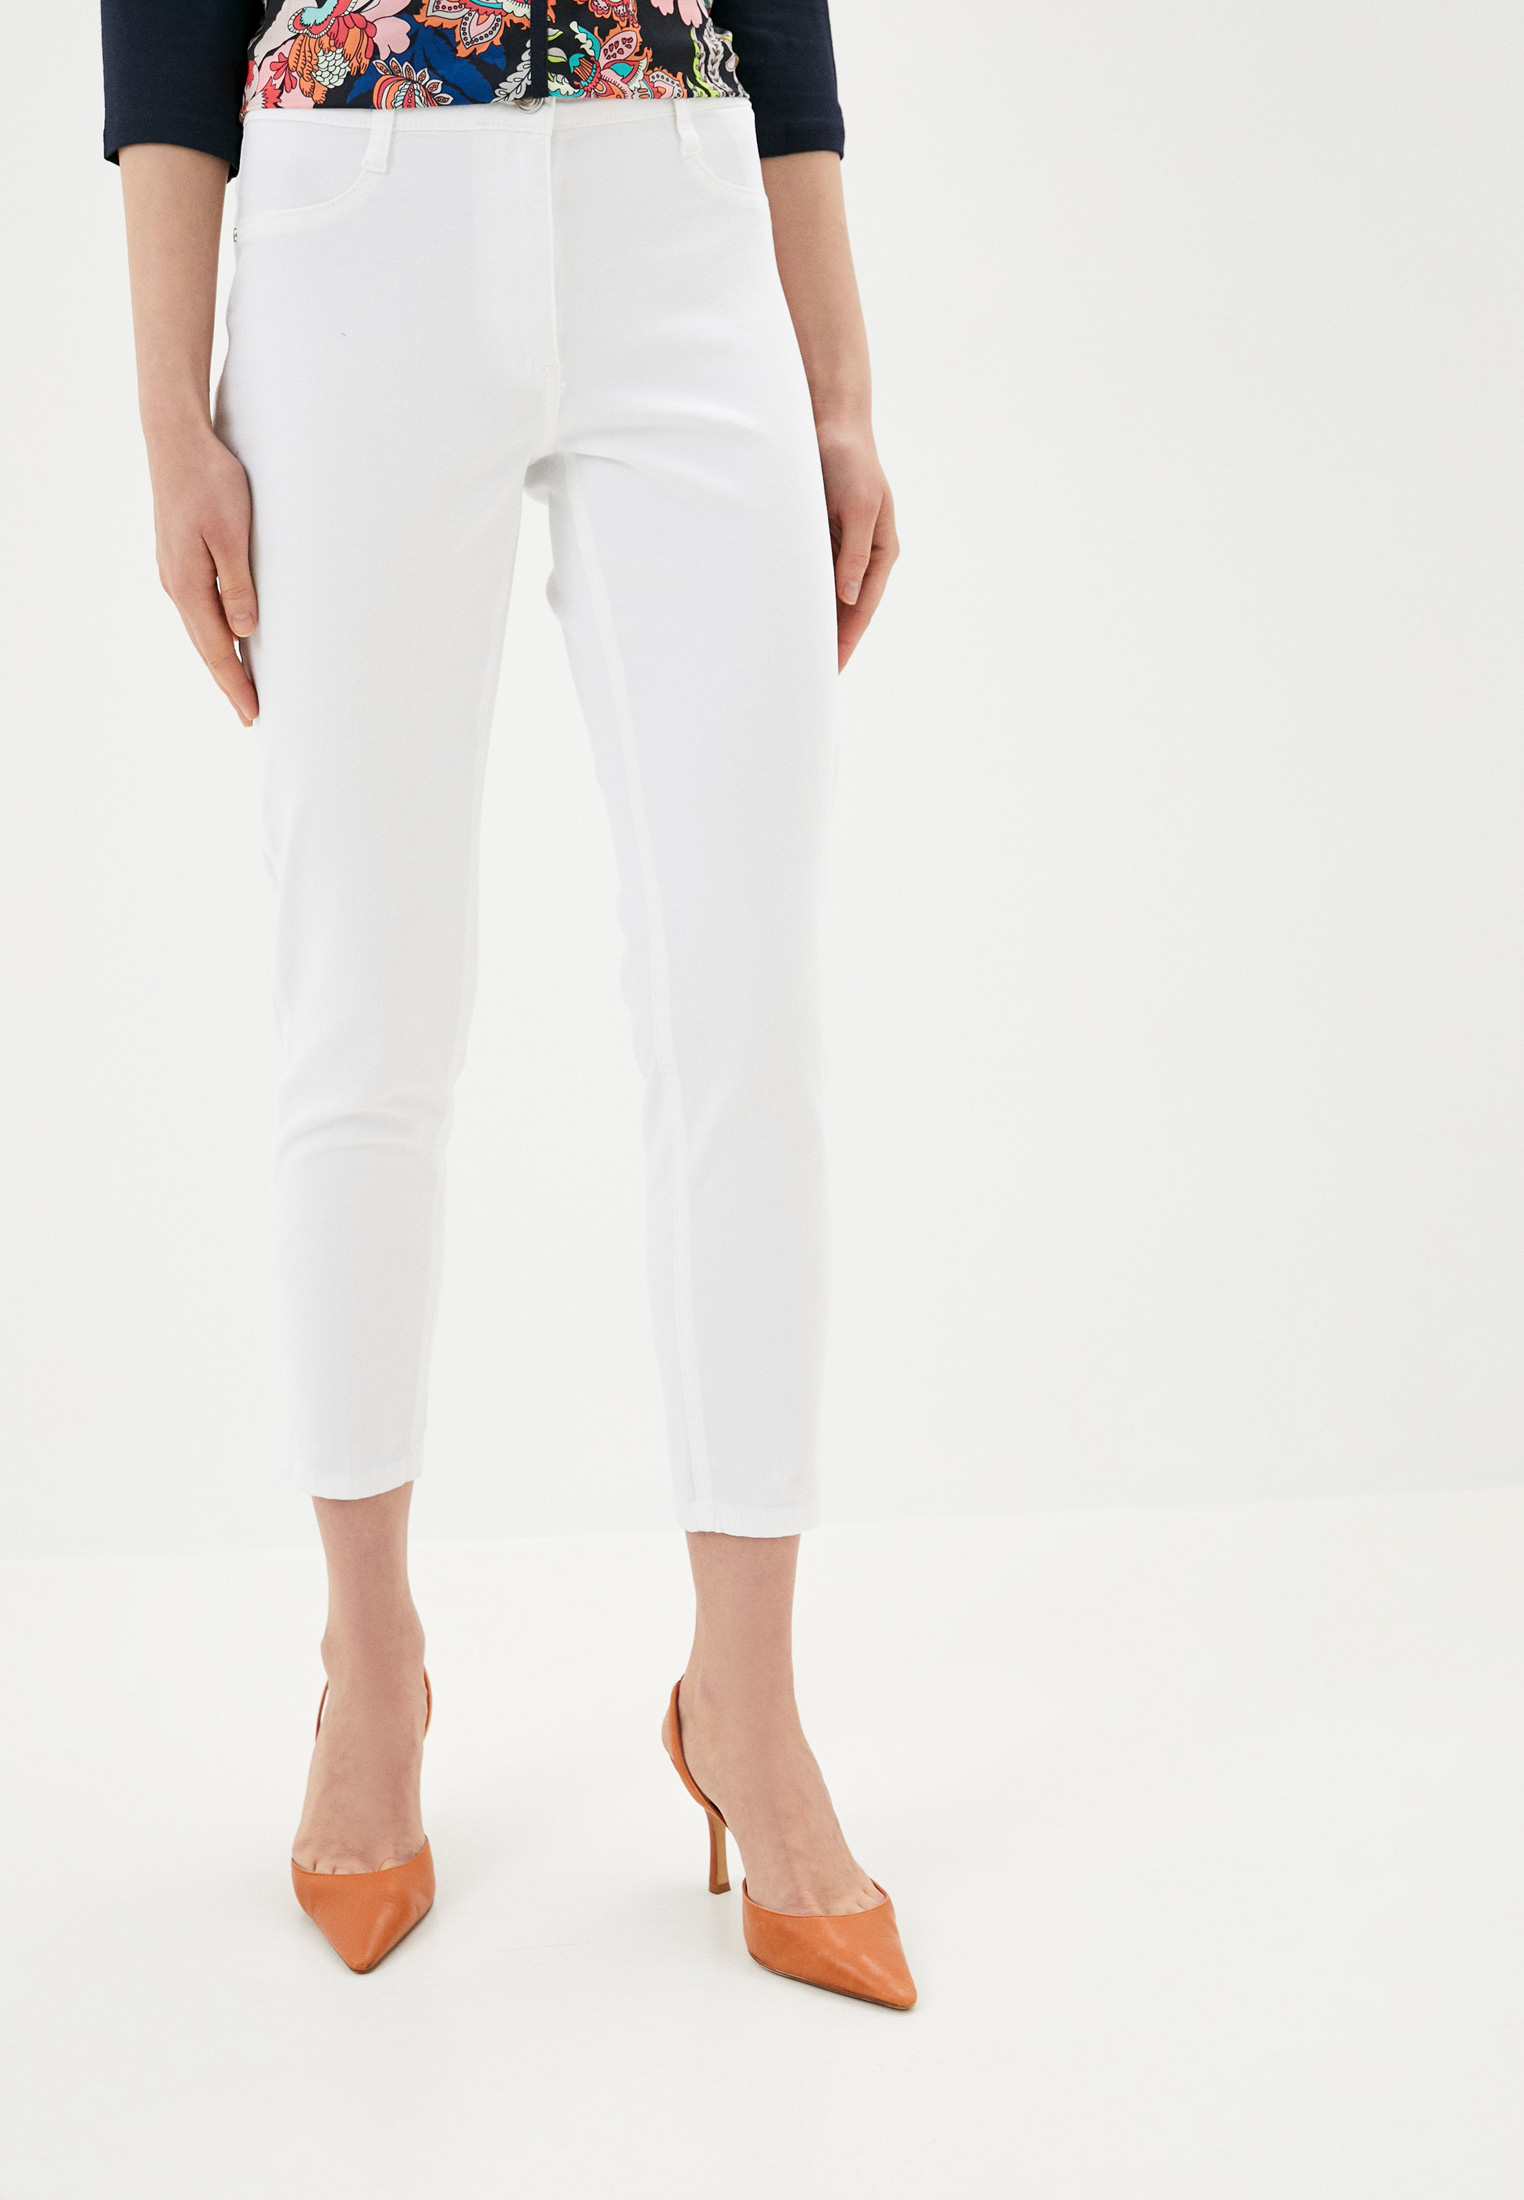 Женские джинсы Betty Barclay 6010/1060